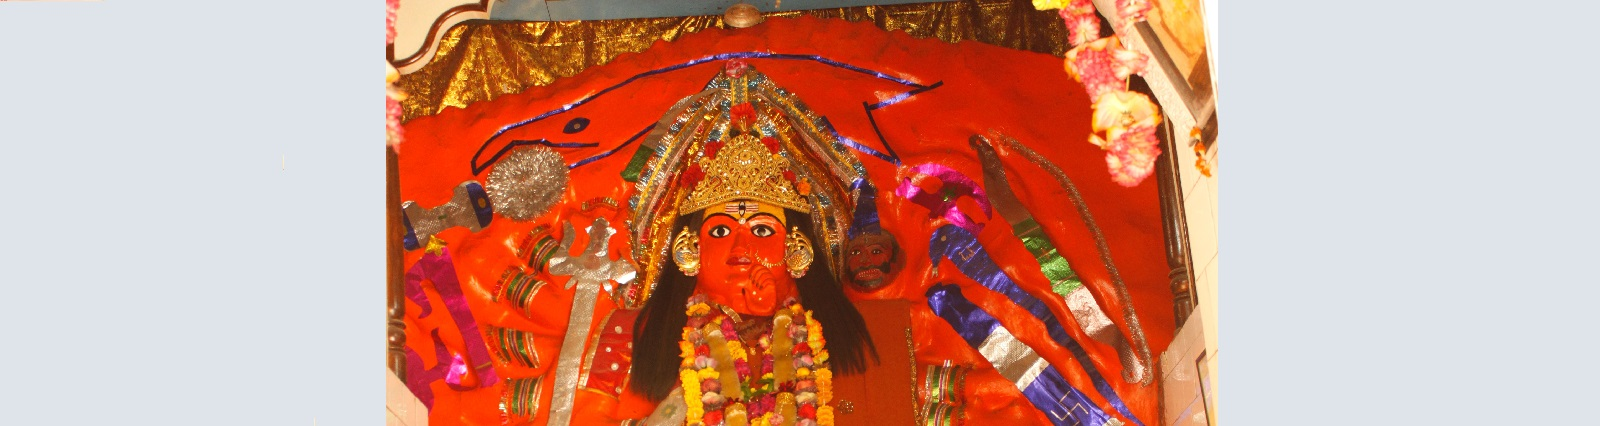 Statue of Devi Bari Chandka Ji Devi Bari Chandika Ji Temple Mahoba